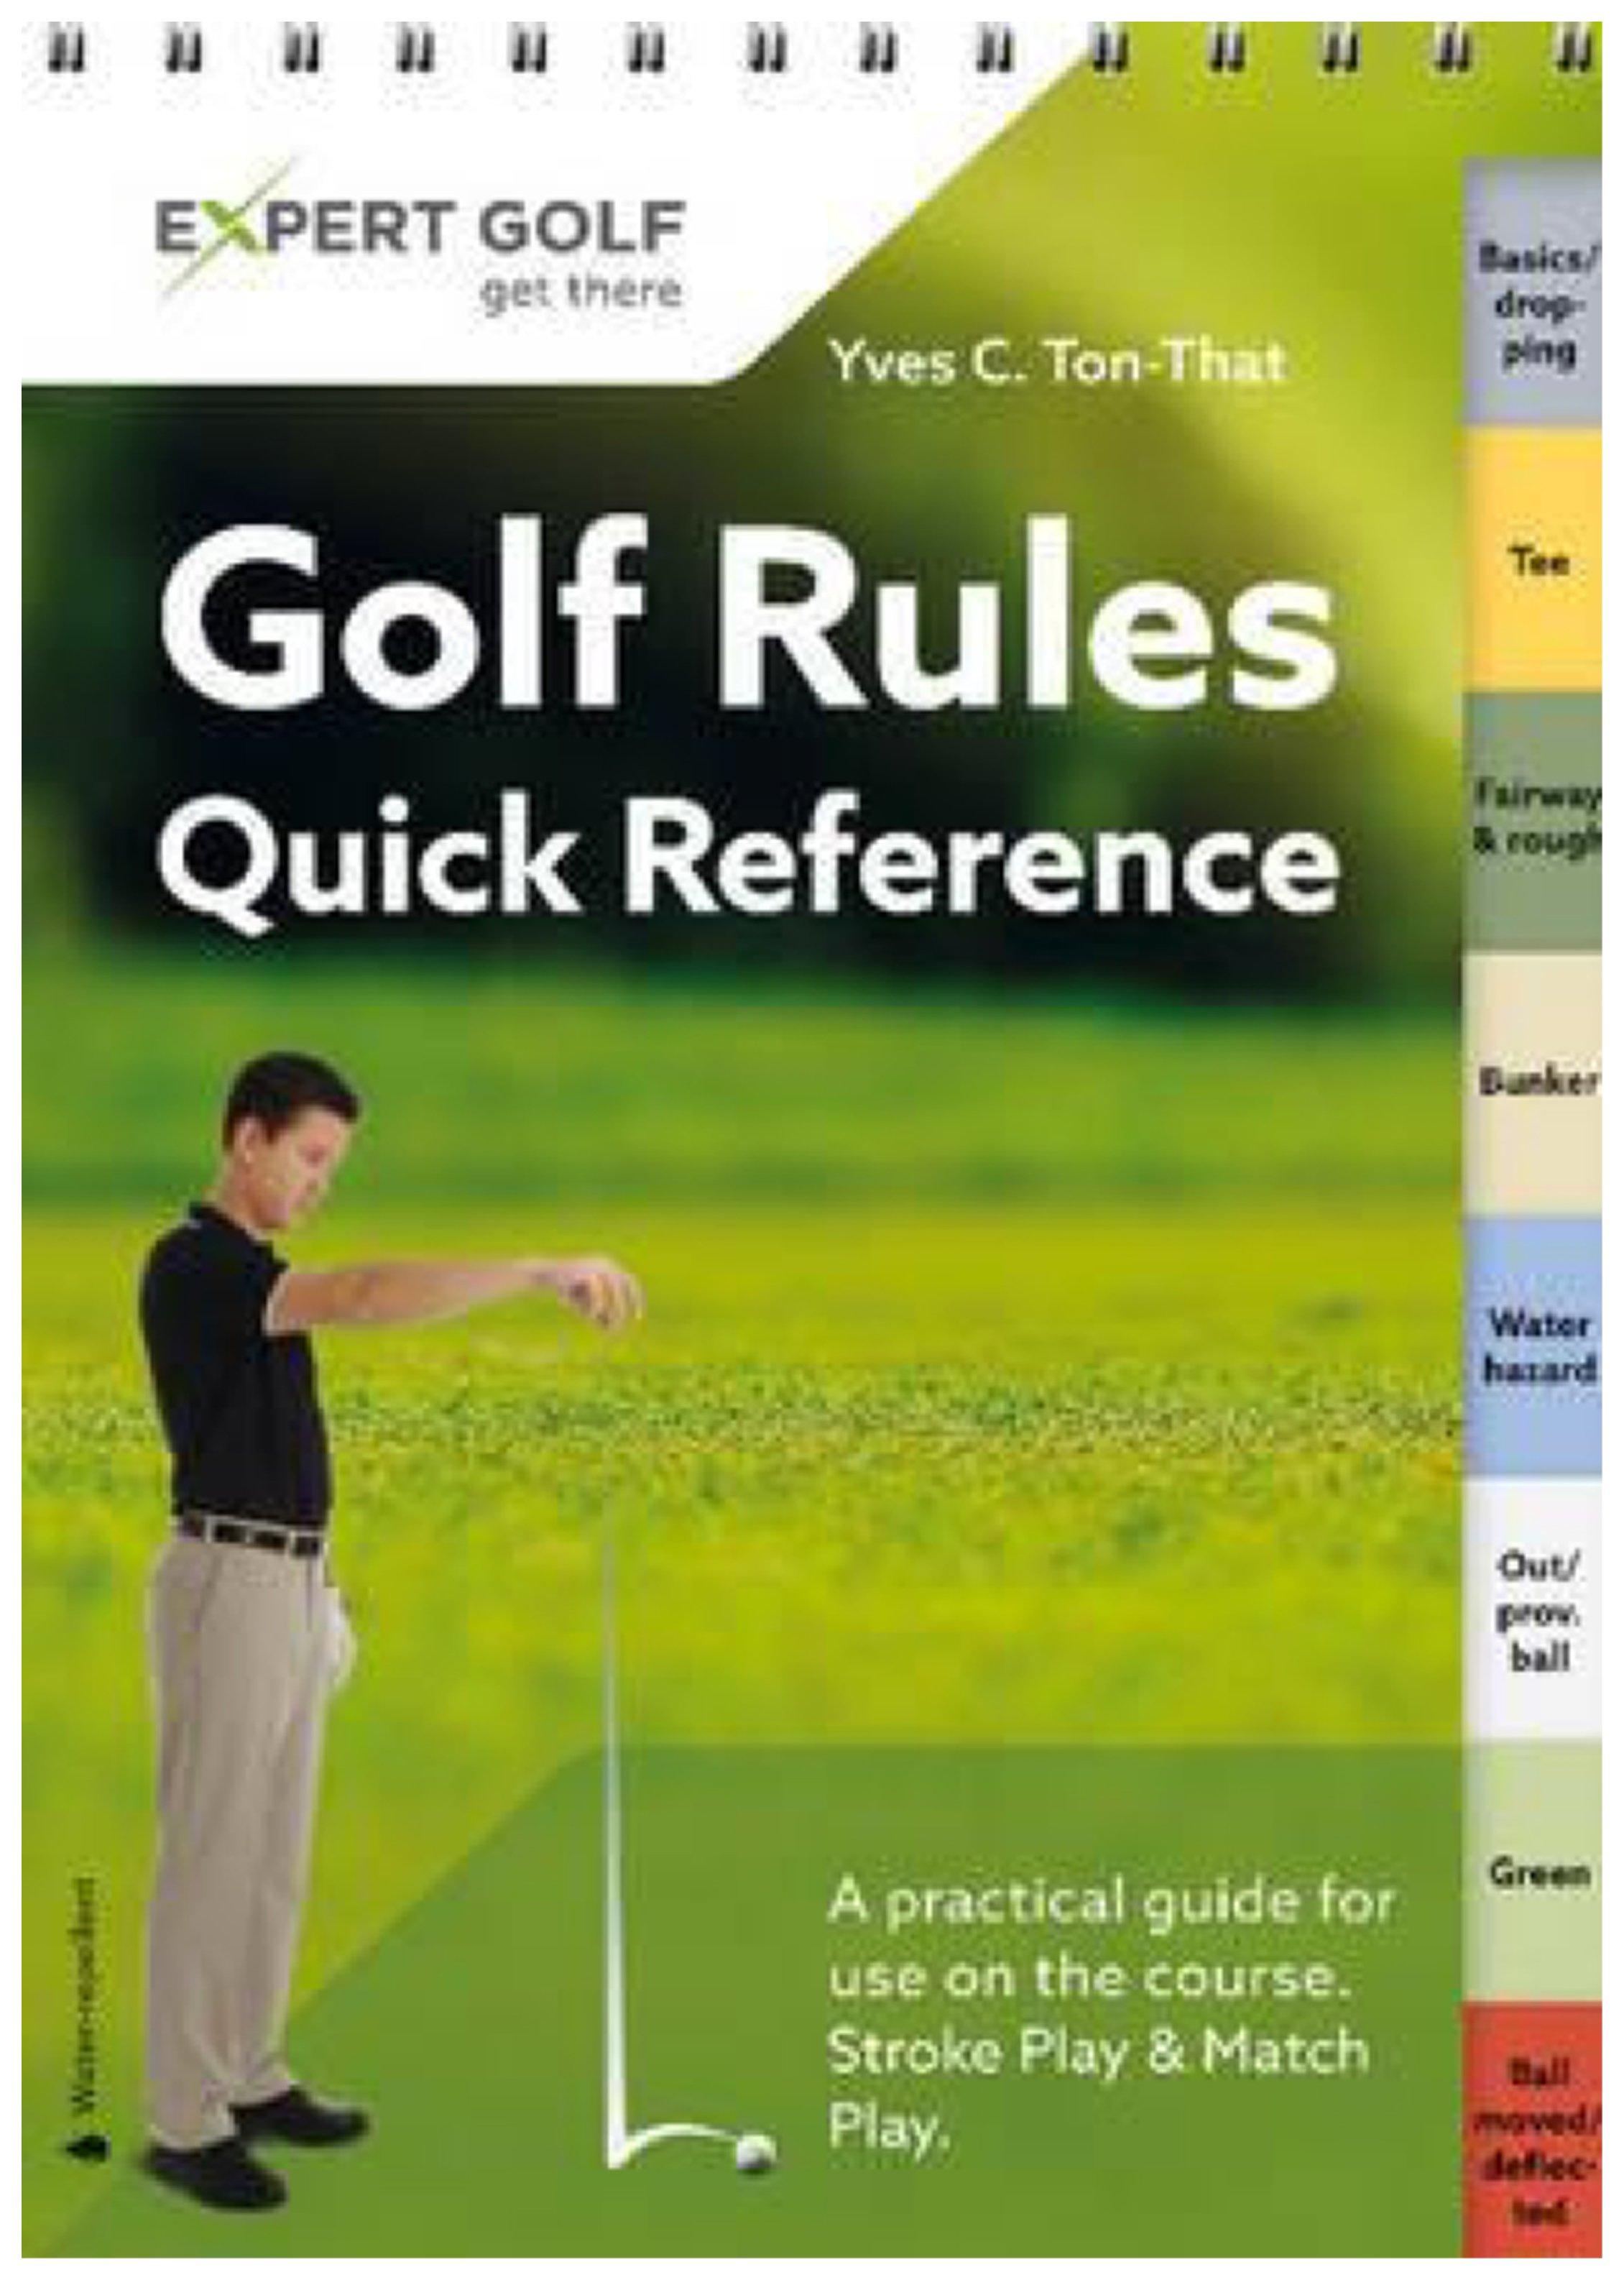 Golf Rules Multi Award Winning Book